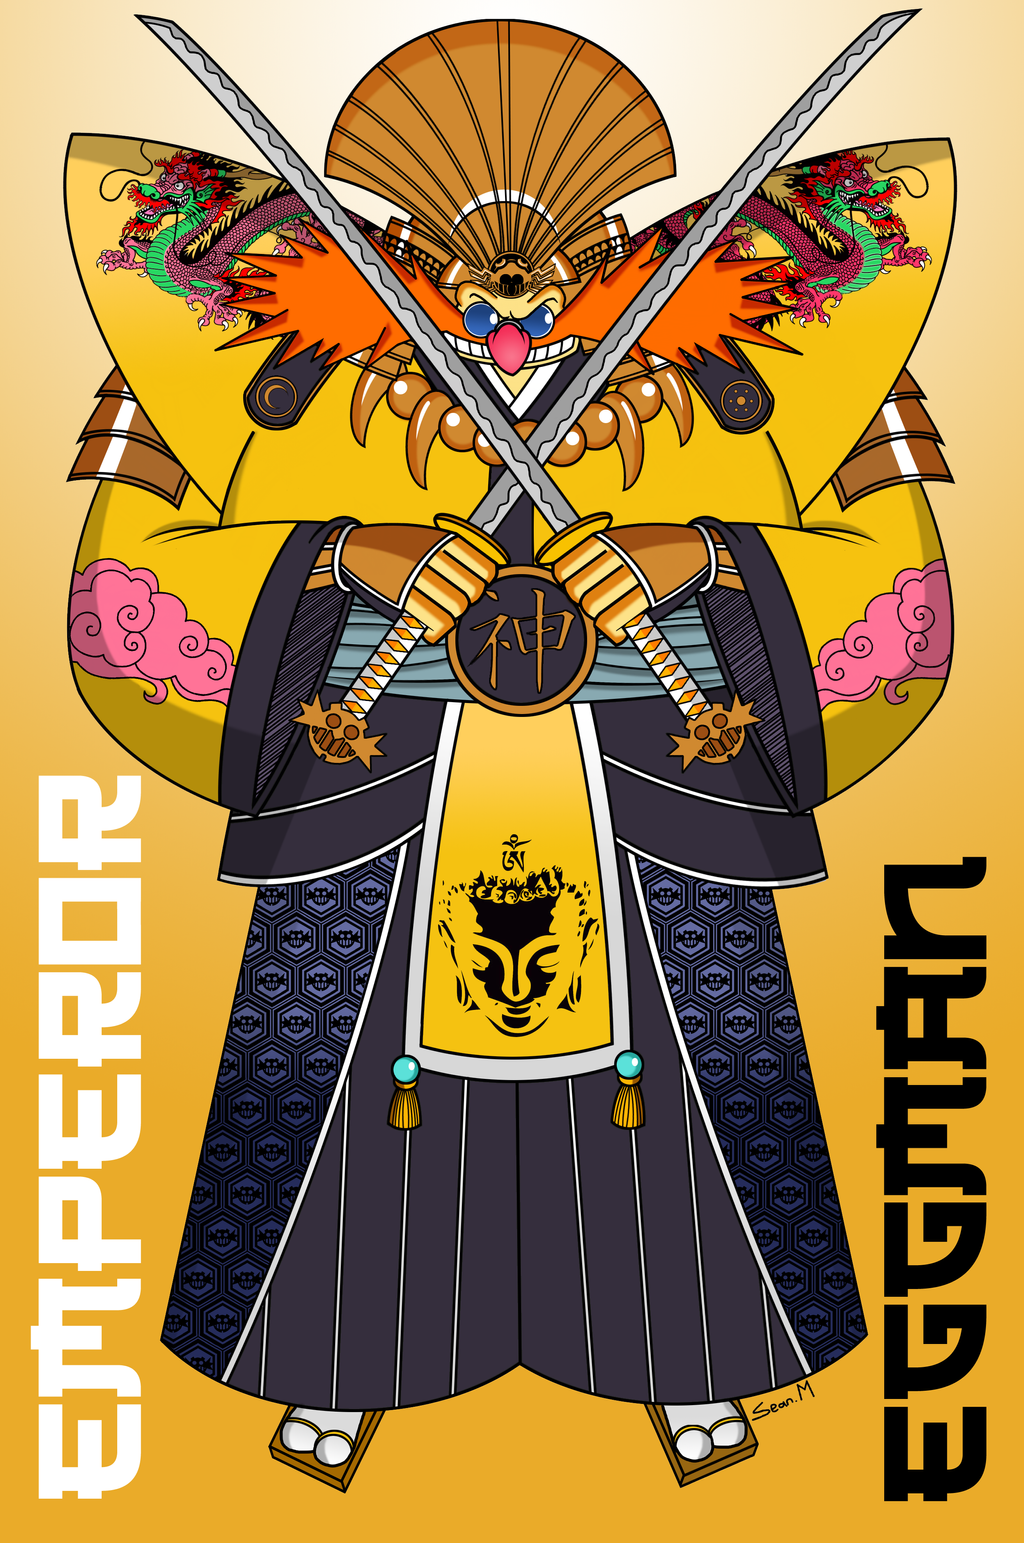 emperor_eggman_by_mobianmonster-dcfxbdm.